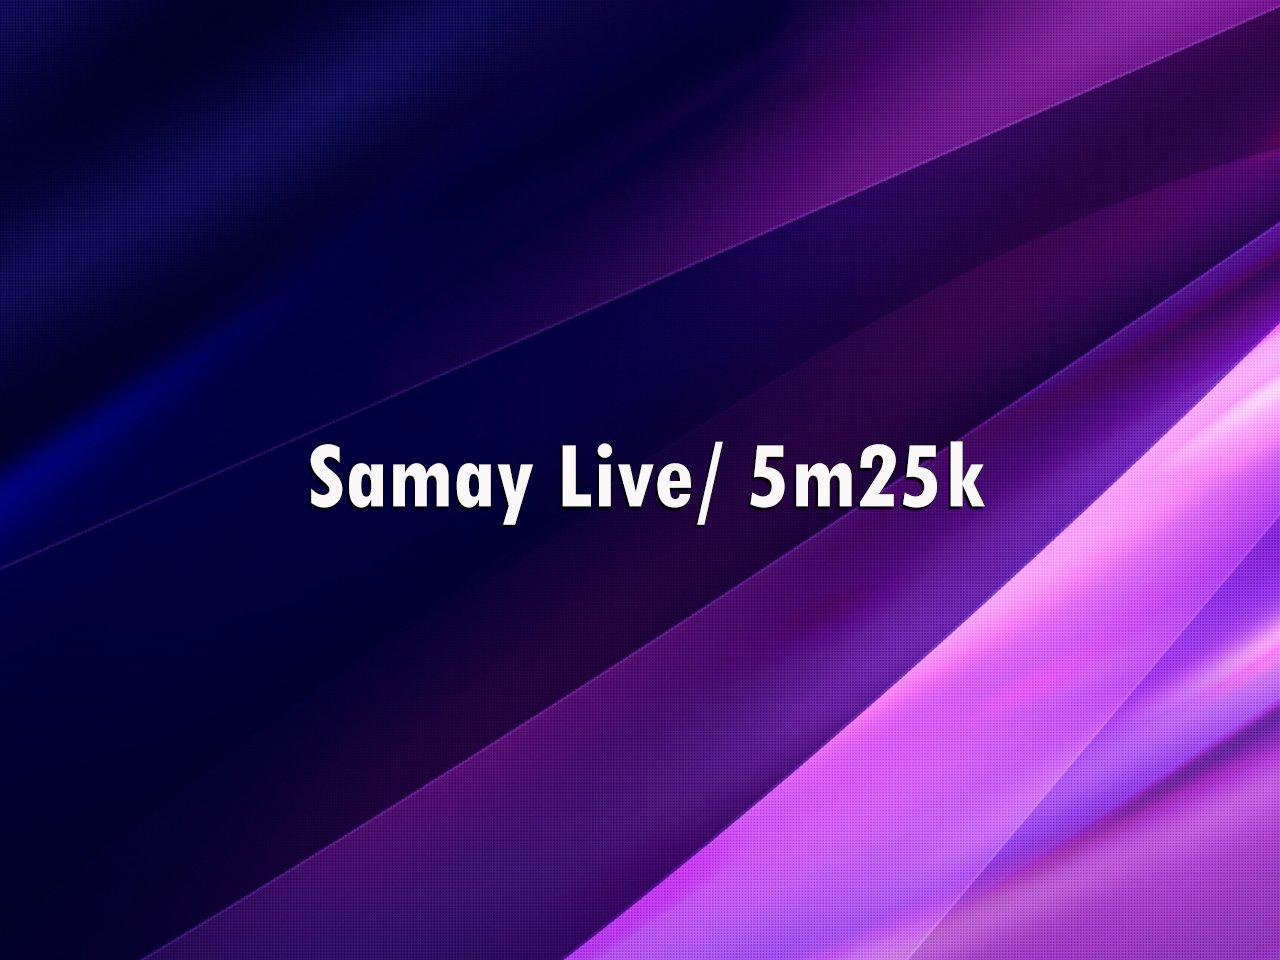 Samay Live/ 5m25k-Samay